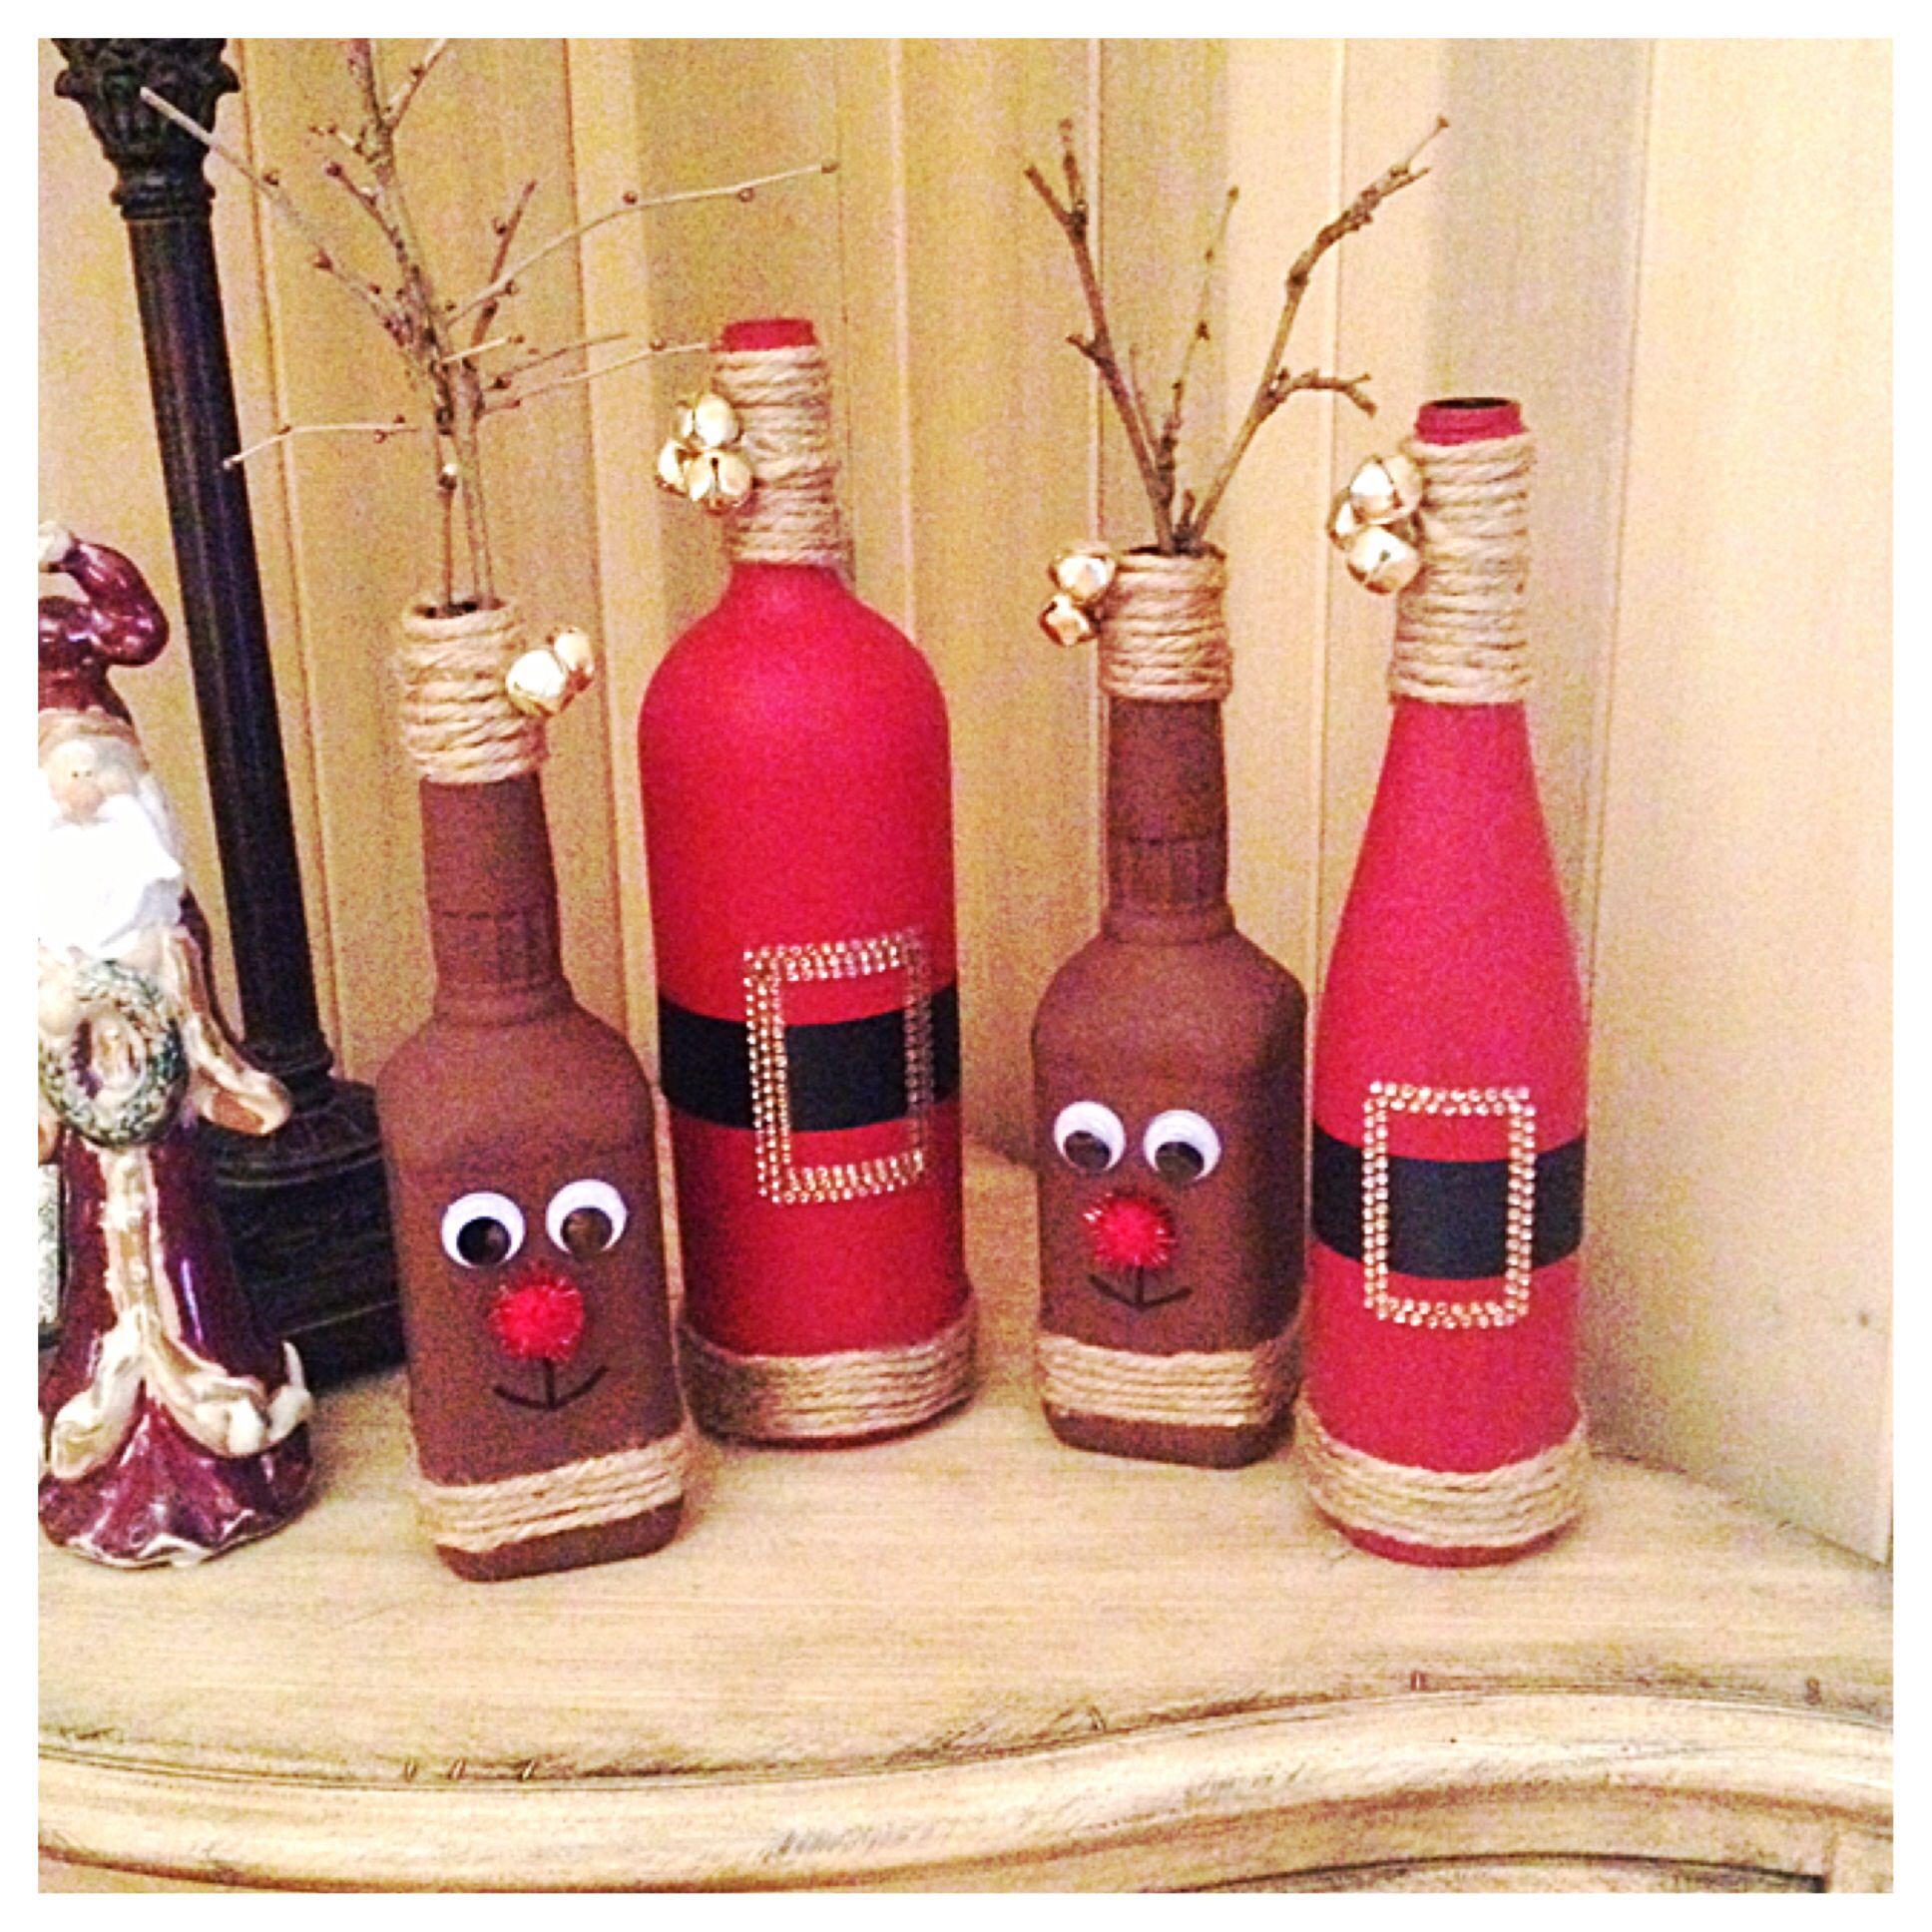 Diy Christmas Decor Reindeer From Old Whiskey Bottles And Santas From Old Wi Decoracion De Botellas Navidenas Botellas Decoradas Para Navidad Botella Navidena